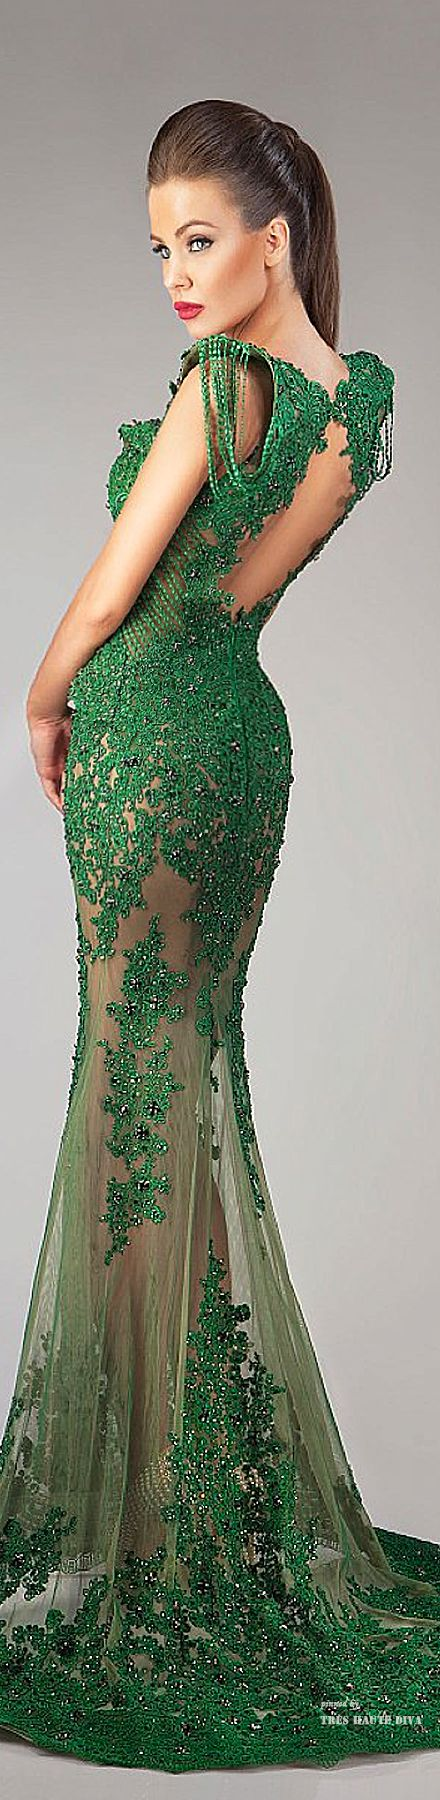 Hanna Toumajean Couture Fall Winter 2014-15 ♔ THD | Mode ...